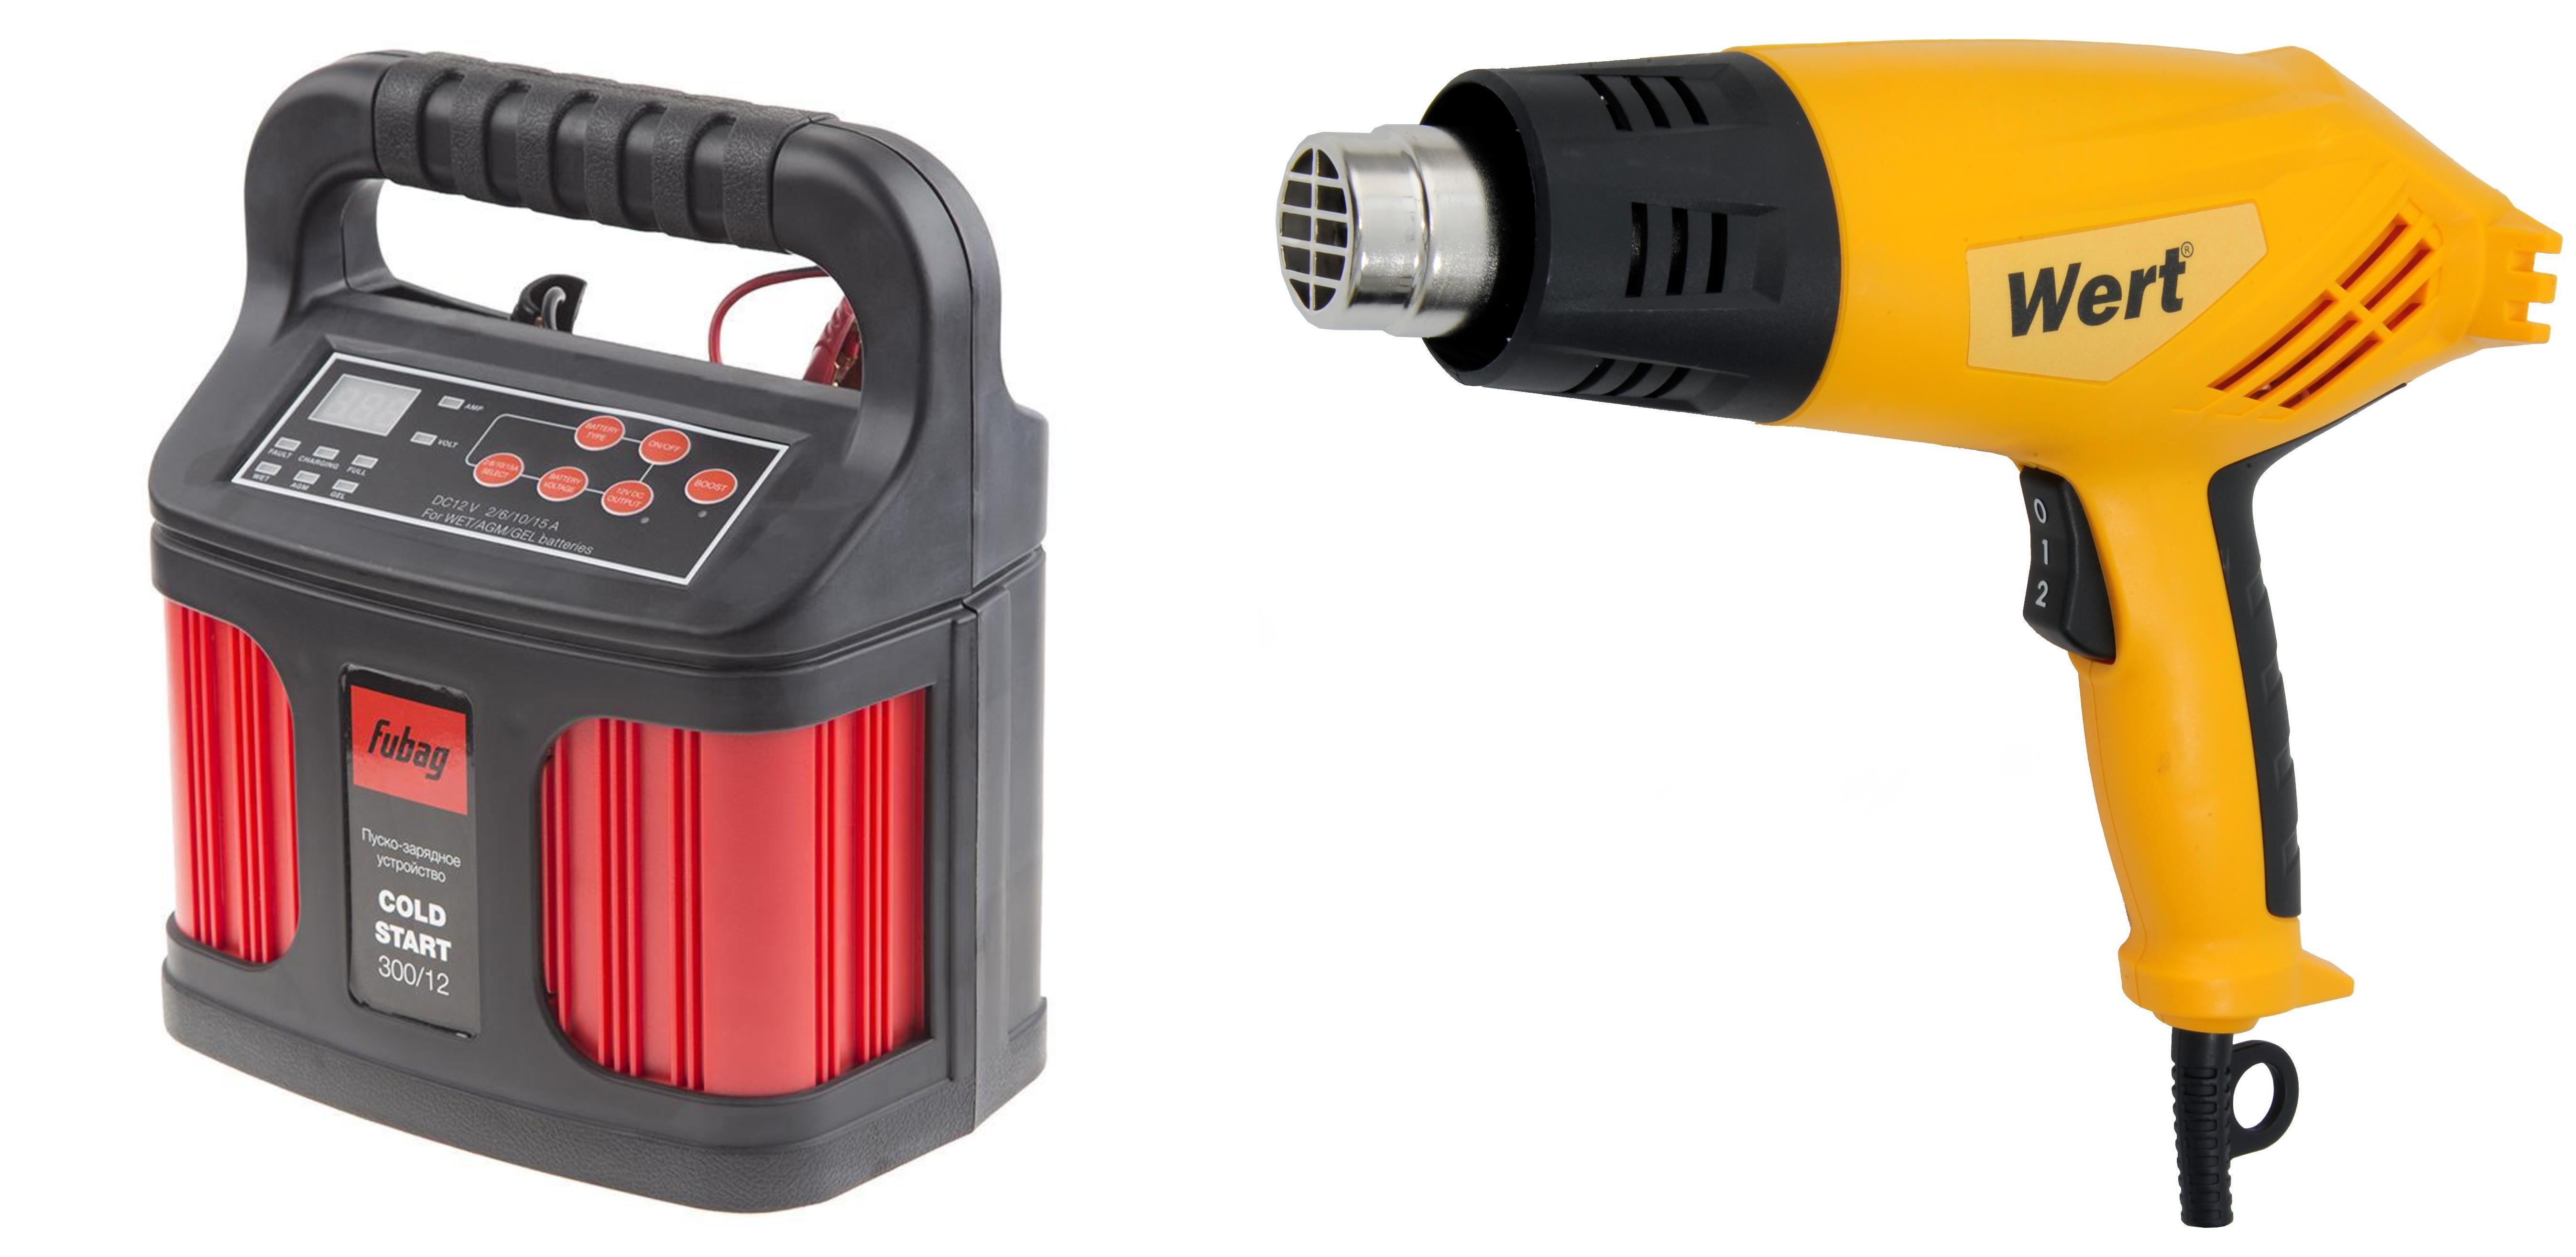 Набор Fubag Устройство пуско-зарядное cold start 300/12 +Фен технический ehg 1800 устройство зарядное fubag micro 80 12 4а